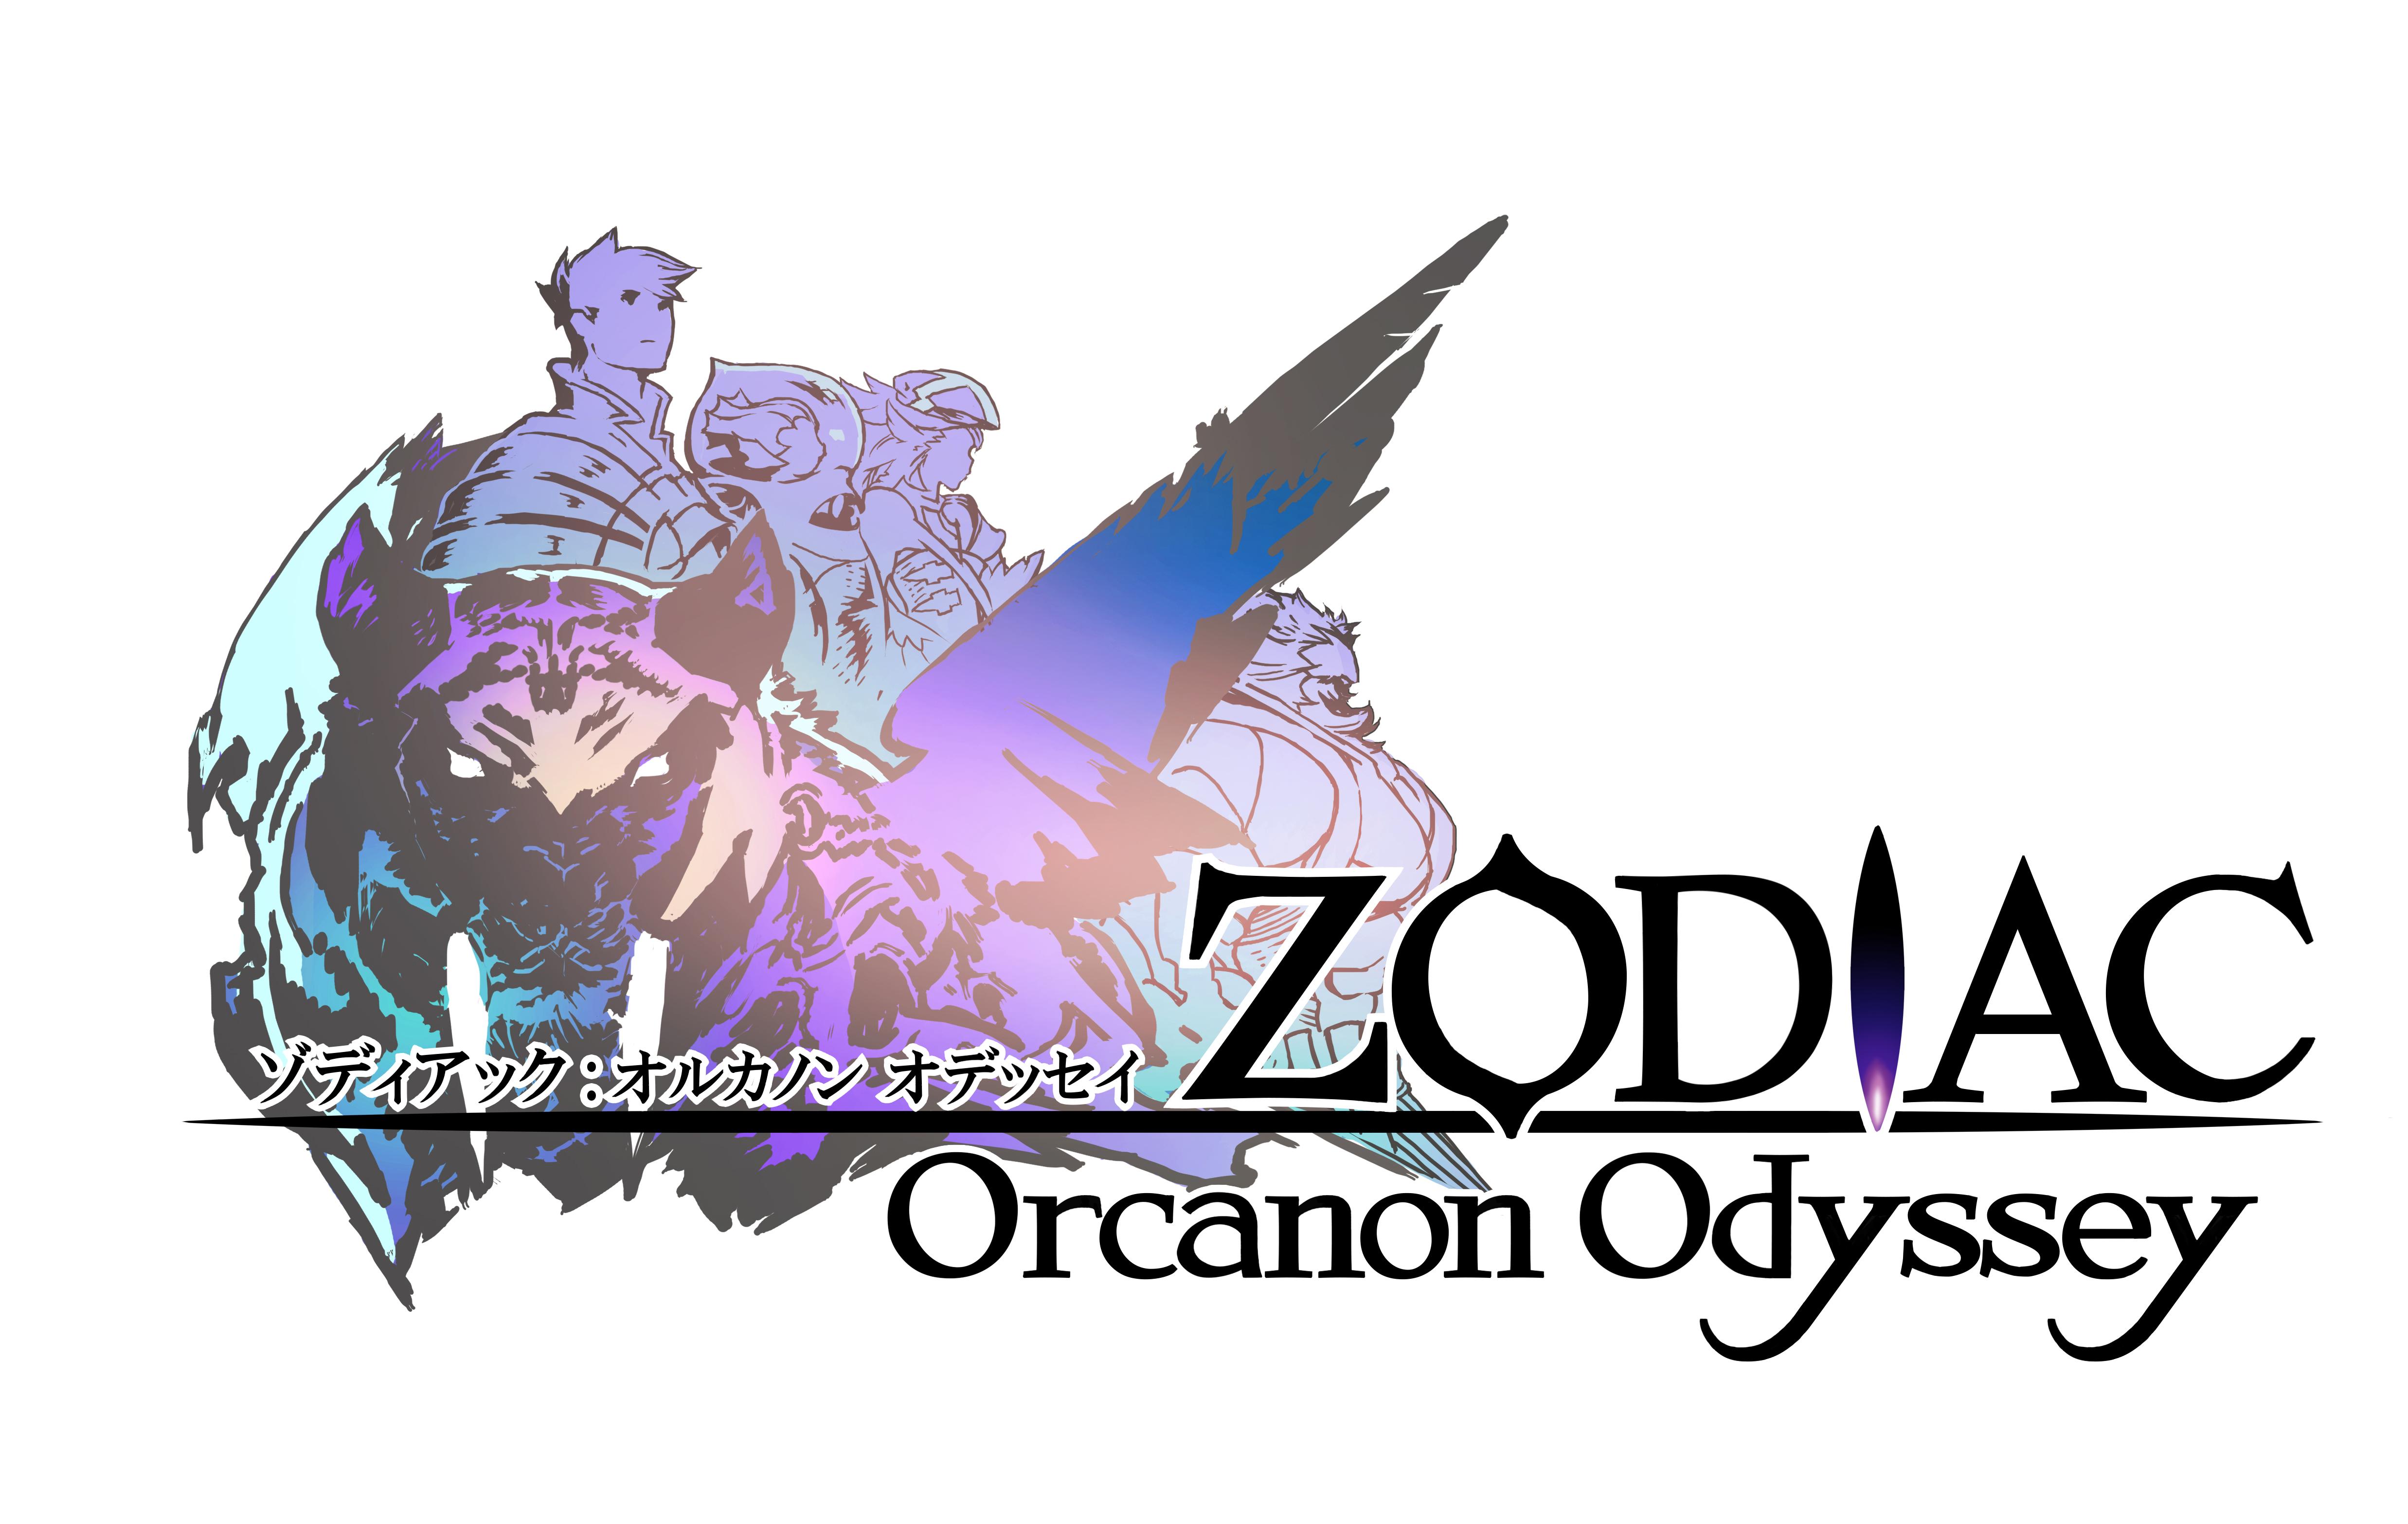 Zodiac - Orcanon Odyssey